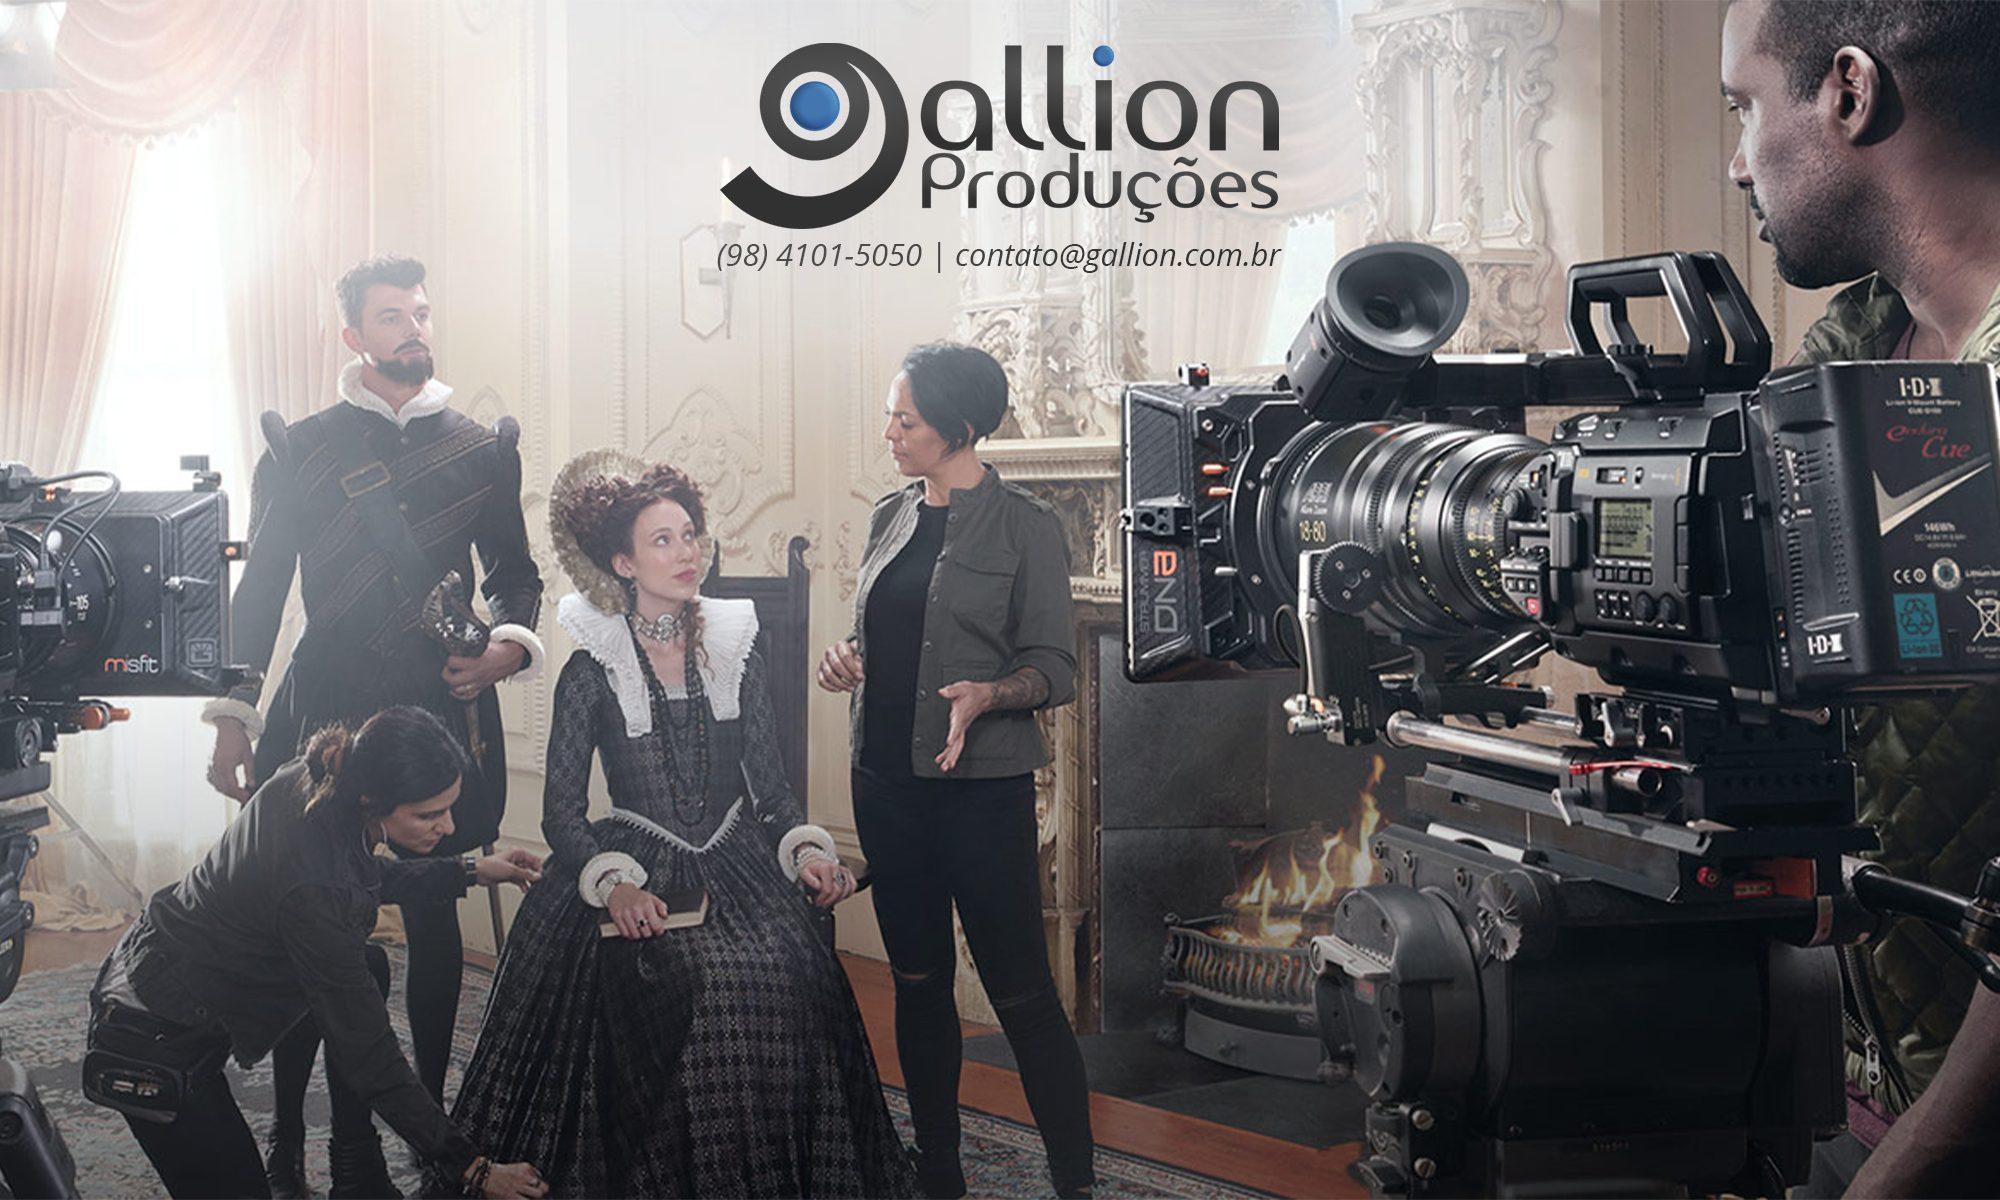 GalLion Produções